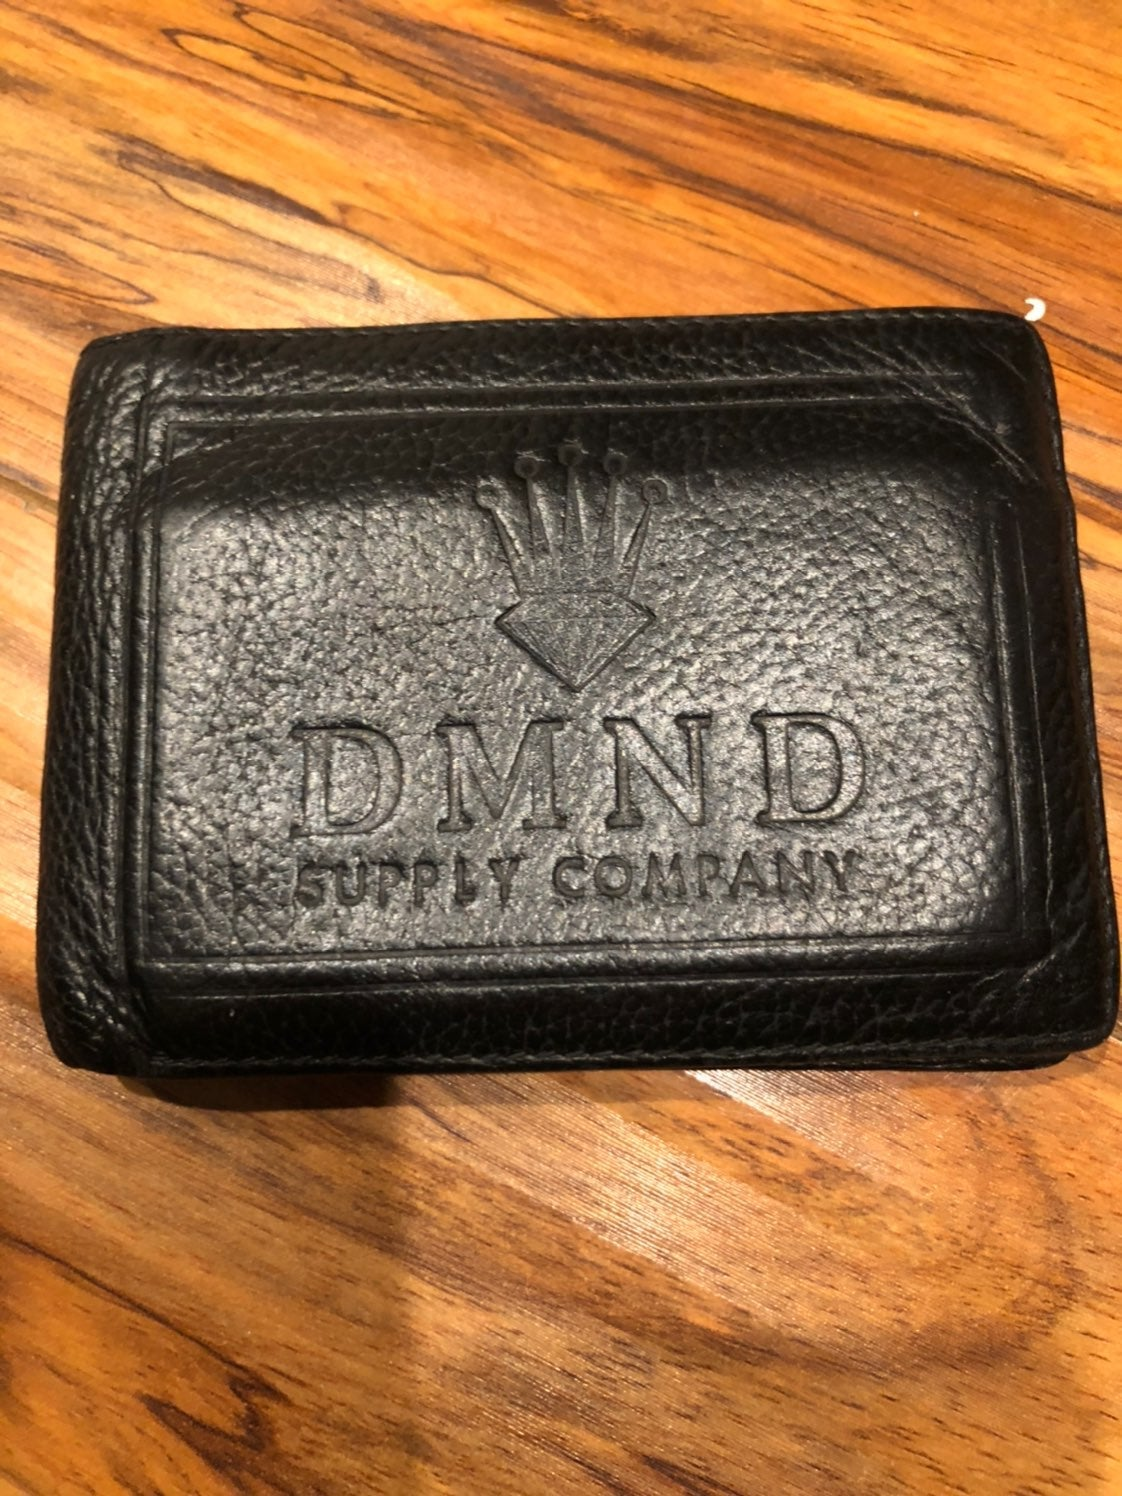 Diamond Supply Co Wallet